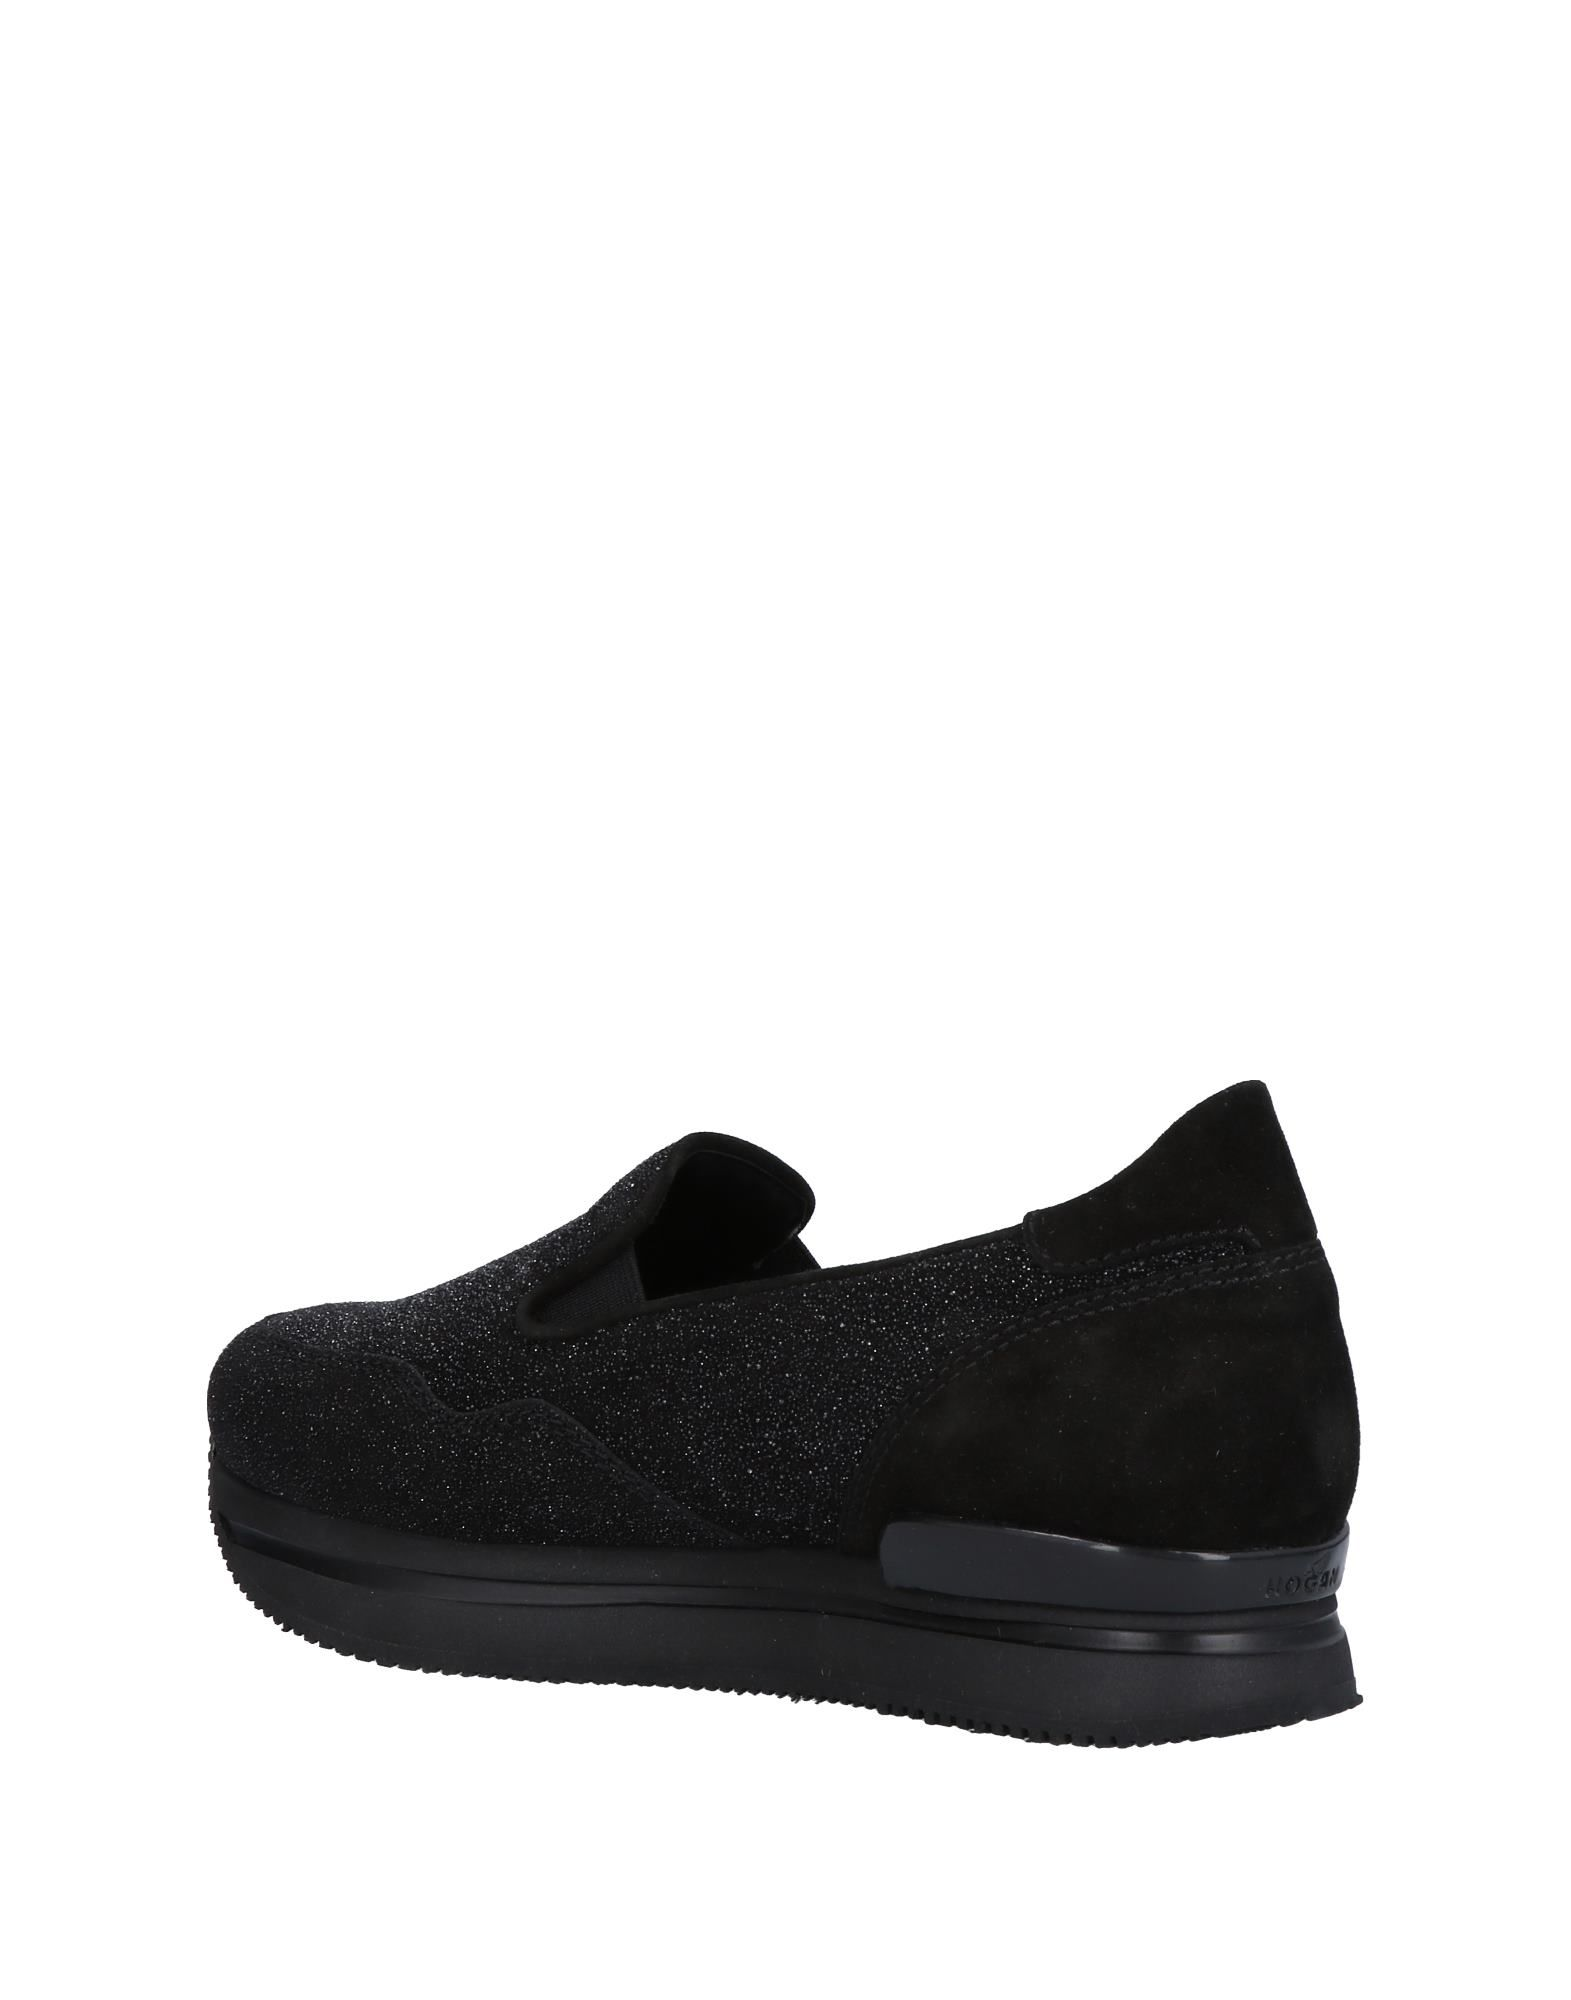 Hogan Mokassins Damen aussehende  11475952UBGut aussehende Damen strapazierfähige Schuhe b90b3b